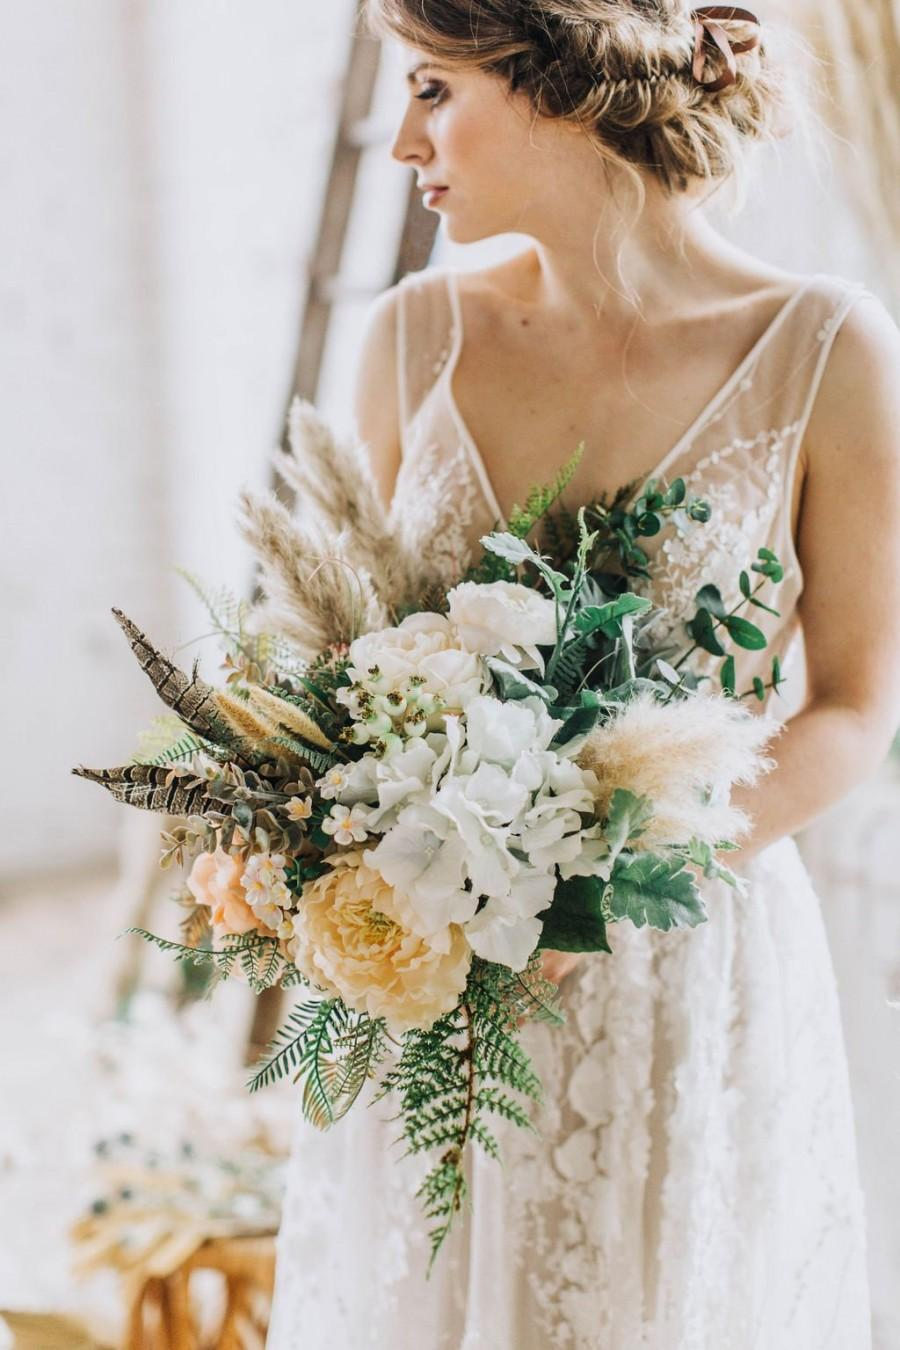 Wedding - Freeform bouquet, peach bouquet, peach wedding flower, wildflower bouquet, boho bouquet, boho wedding, silk bouquet, artificial bouquet